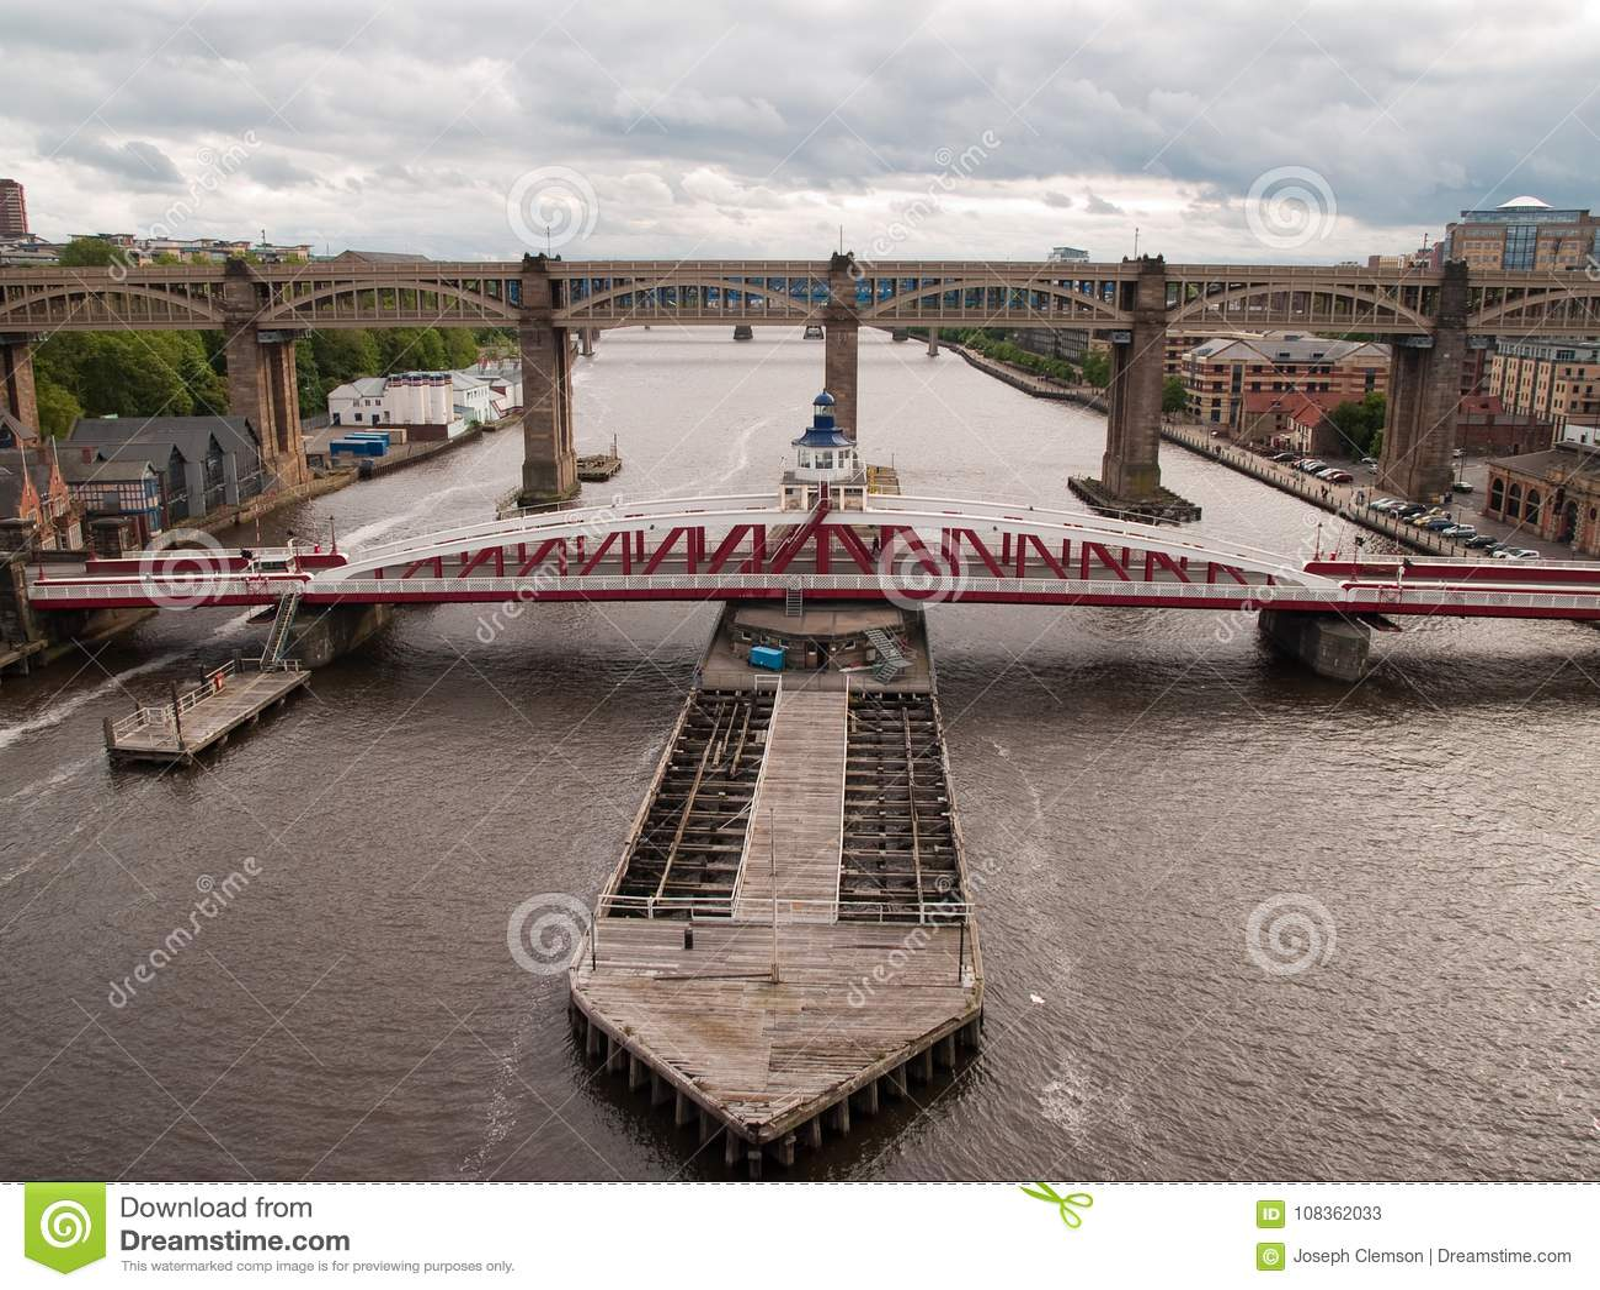 Newcastle swing and High Level road-rail bridge